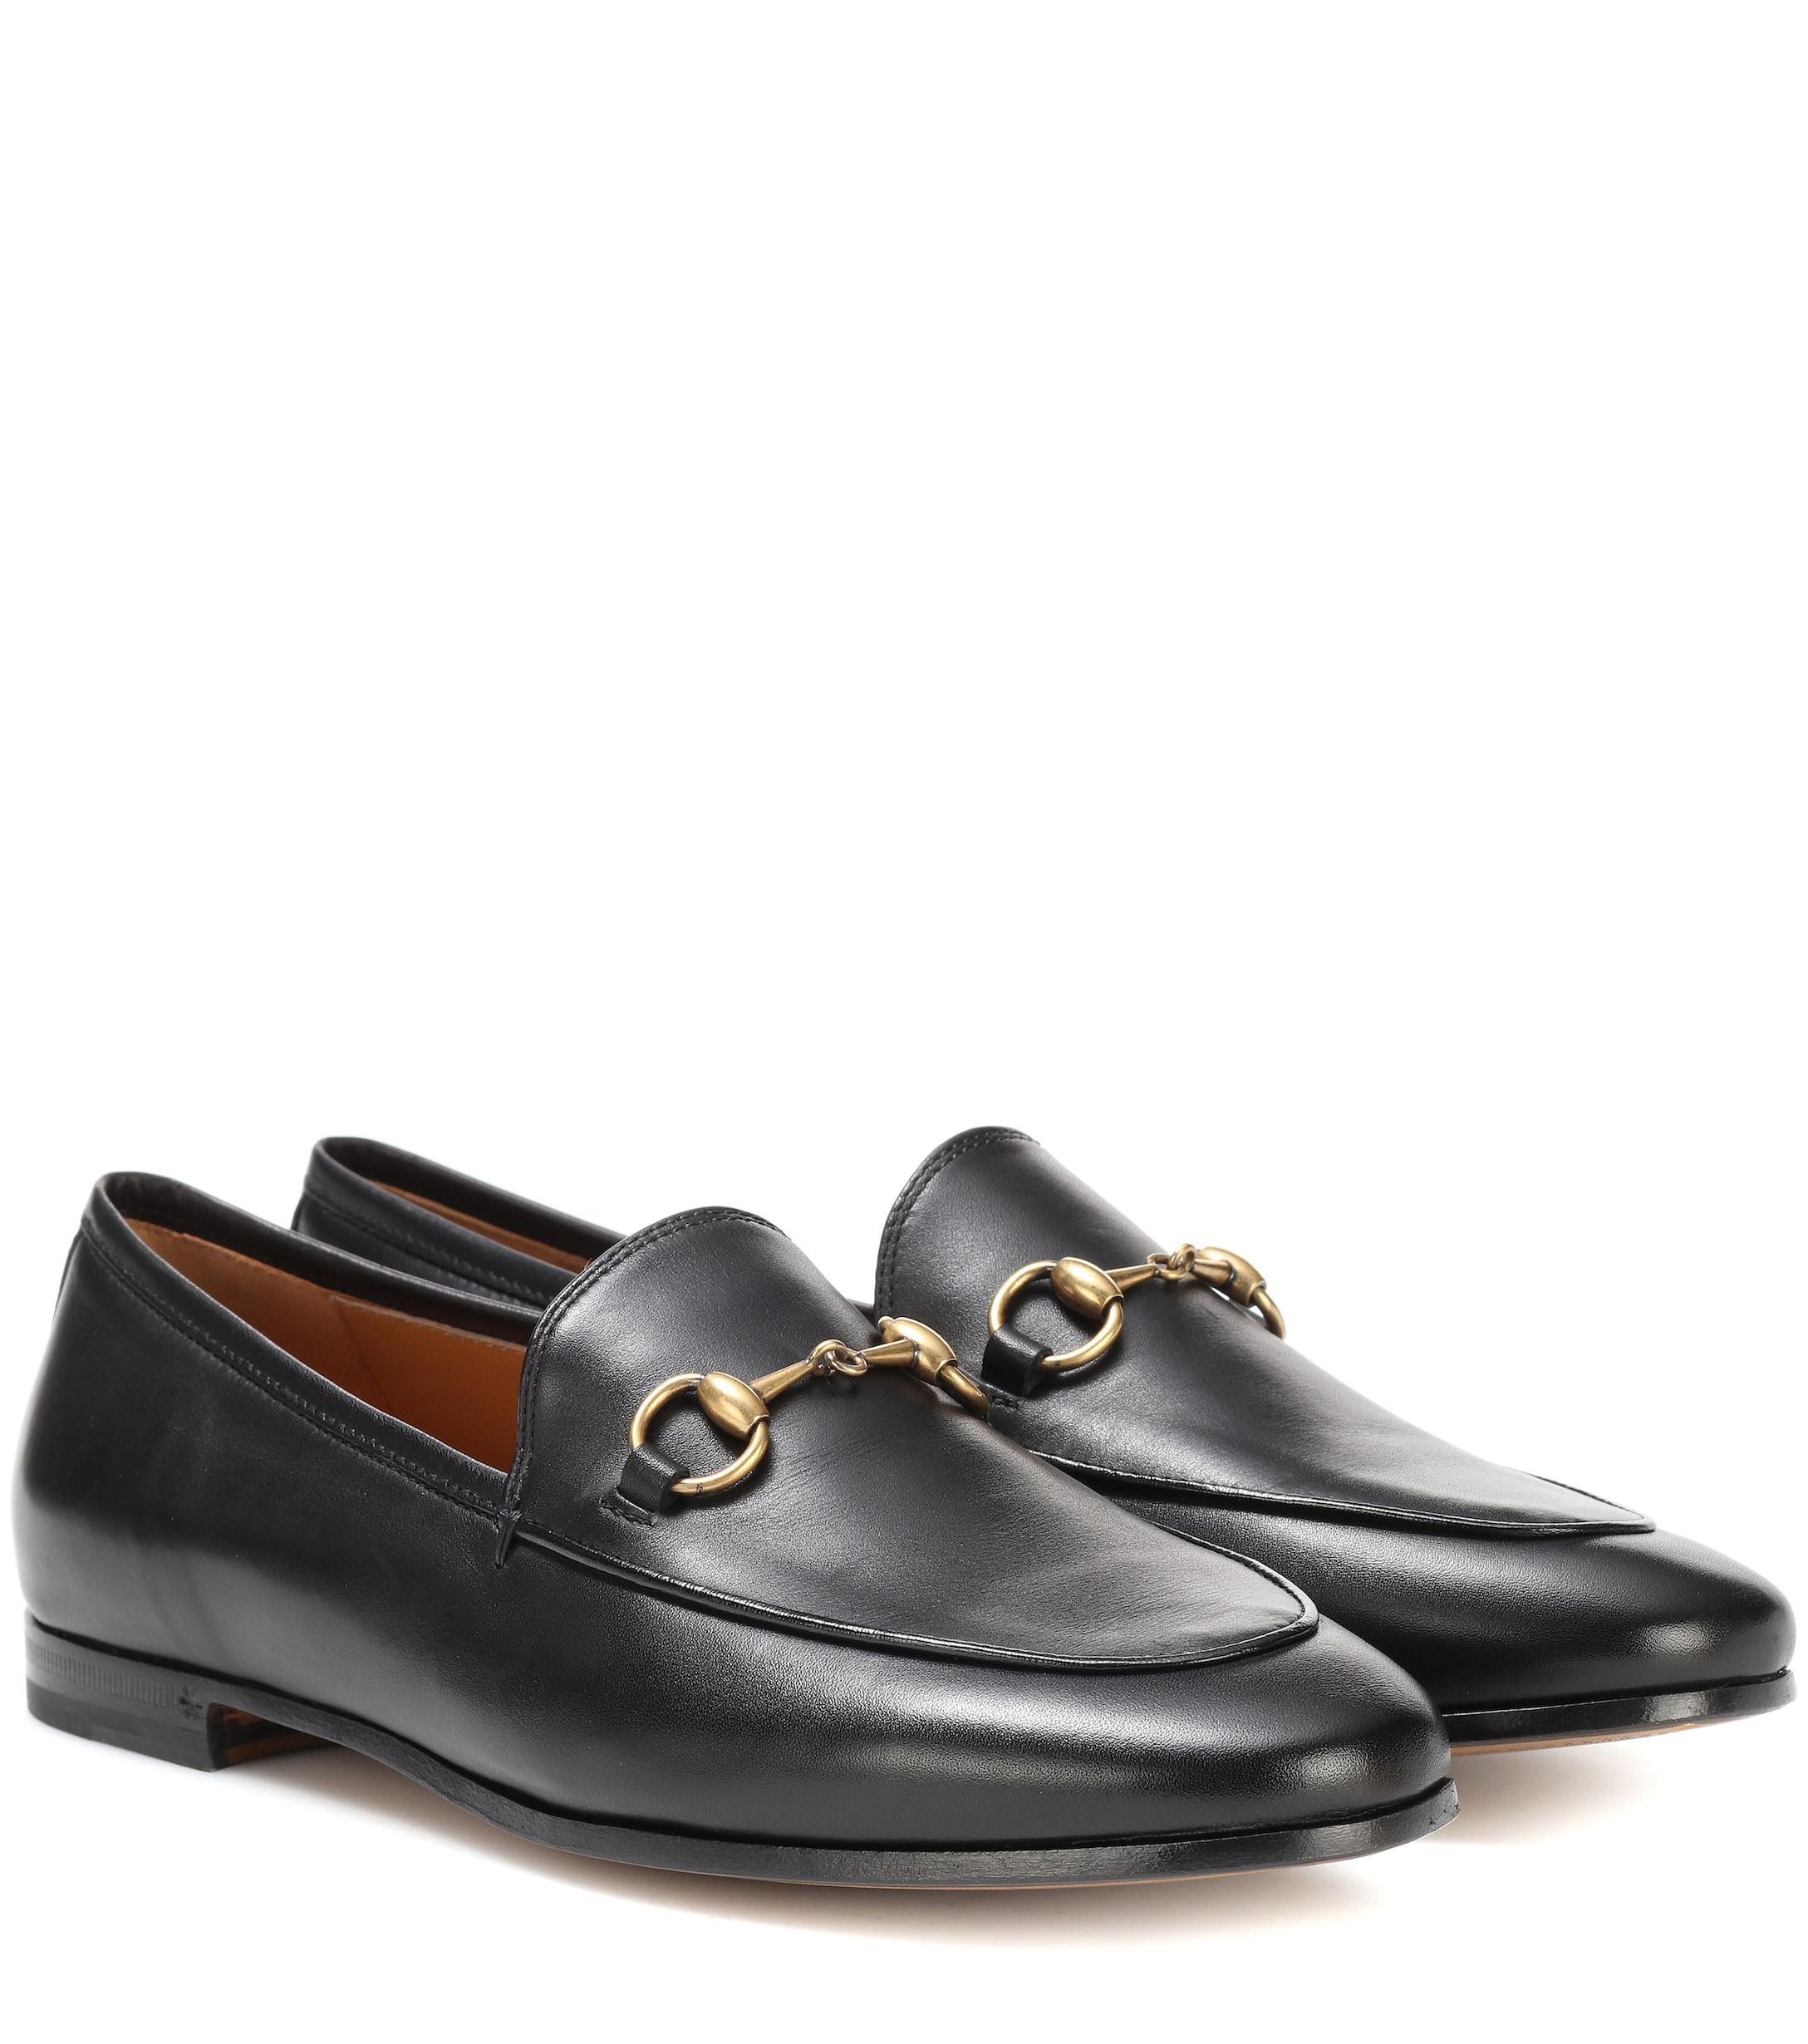 d157f85fec5 Lyst - Gucci Jordaan Leather Loafers in Black